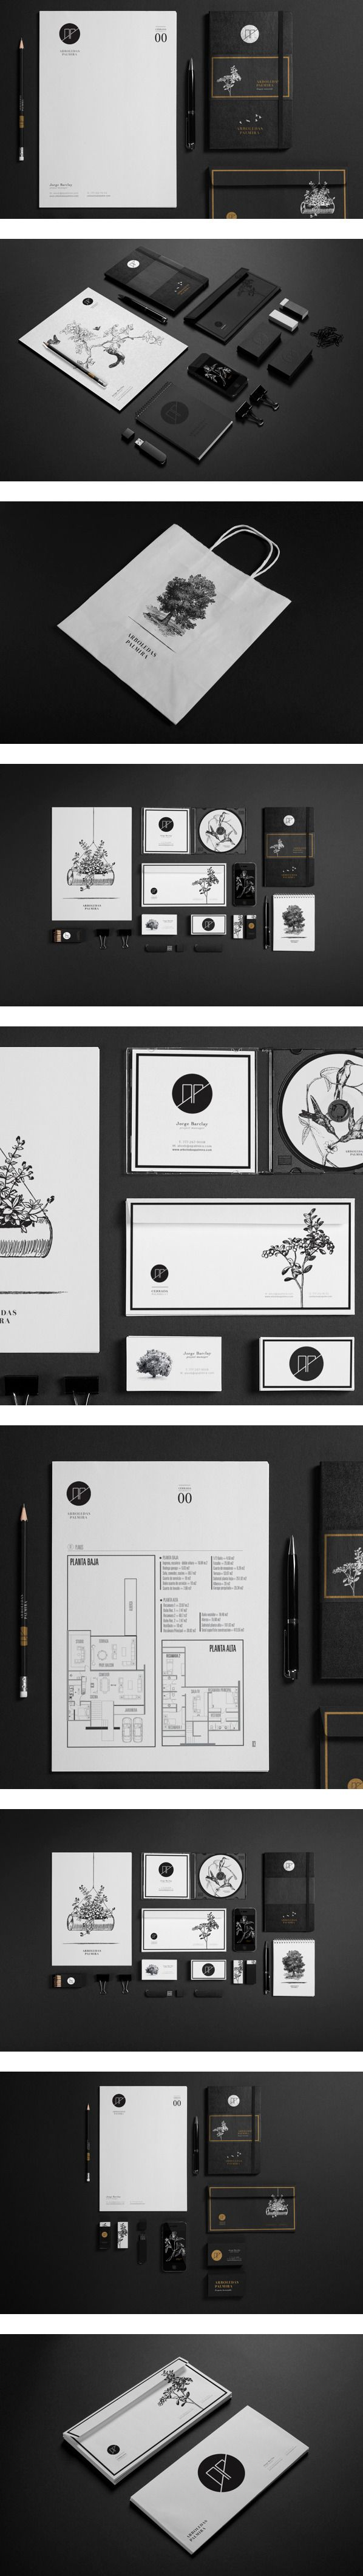 AP by Diego Leyva, via Behance | #stationary #corporate #design #corporatedesign #identity #branding #marketing < repinned by www.BlickeDeeler.de | Take a look at www.LogoGestaltung-Hamburg.de